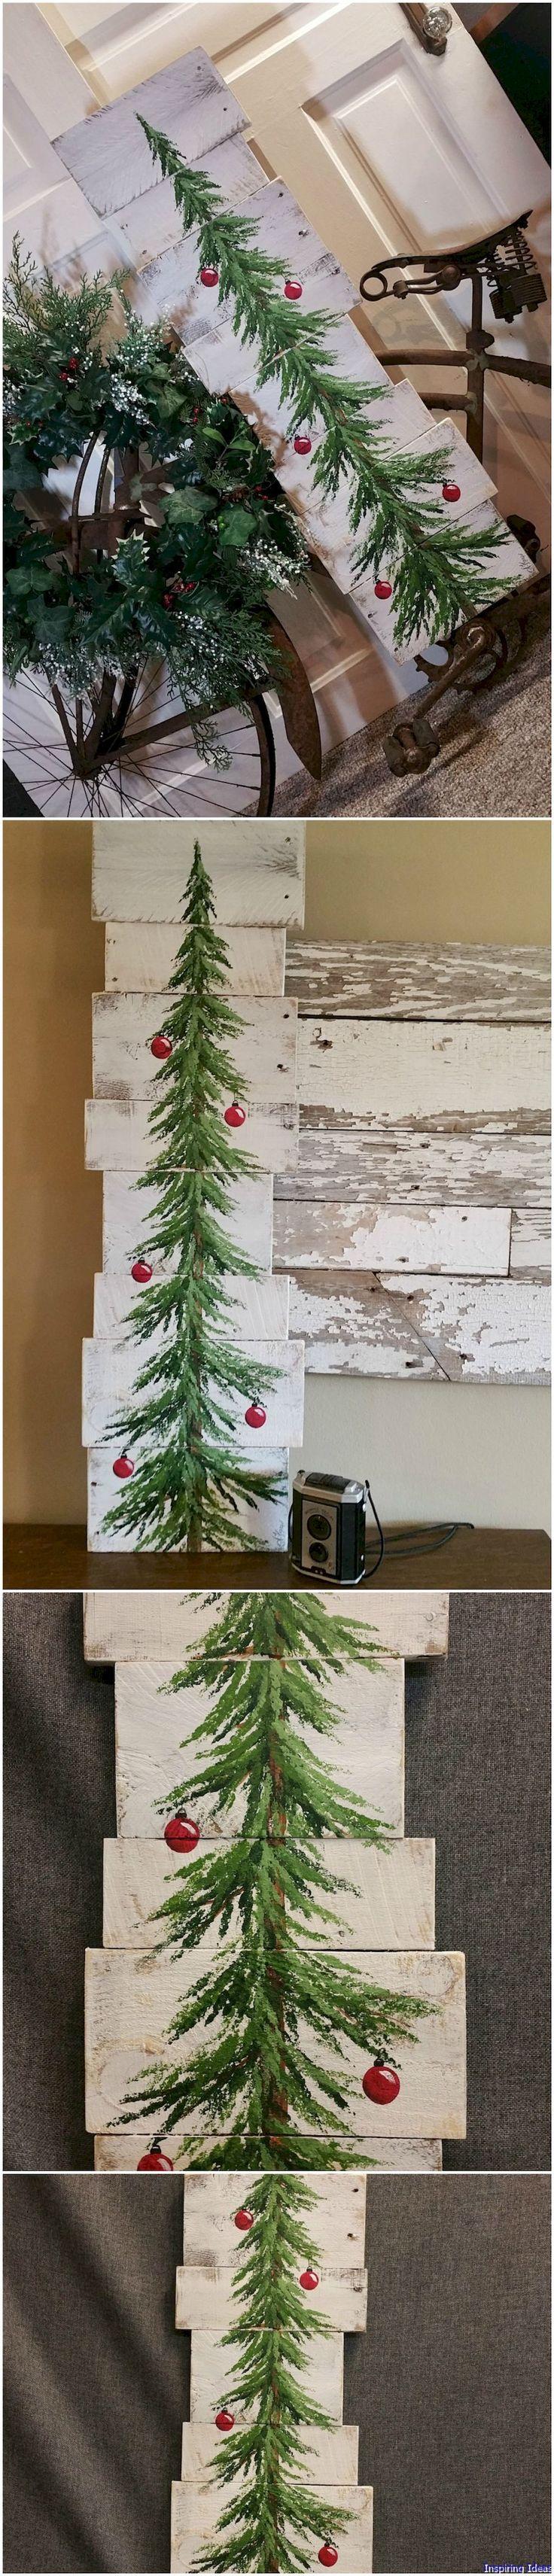 Gorgeous 45 Joyful Christmas Porch Decor Ideas https://lovelyving.com/2017/10/21/45-joyful-christmas-porch-decor-ideas/